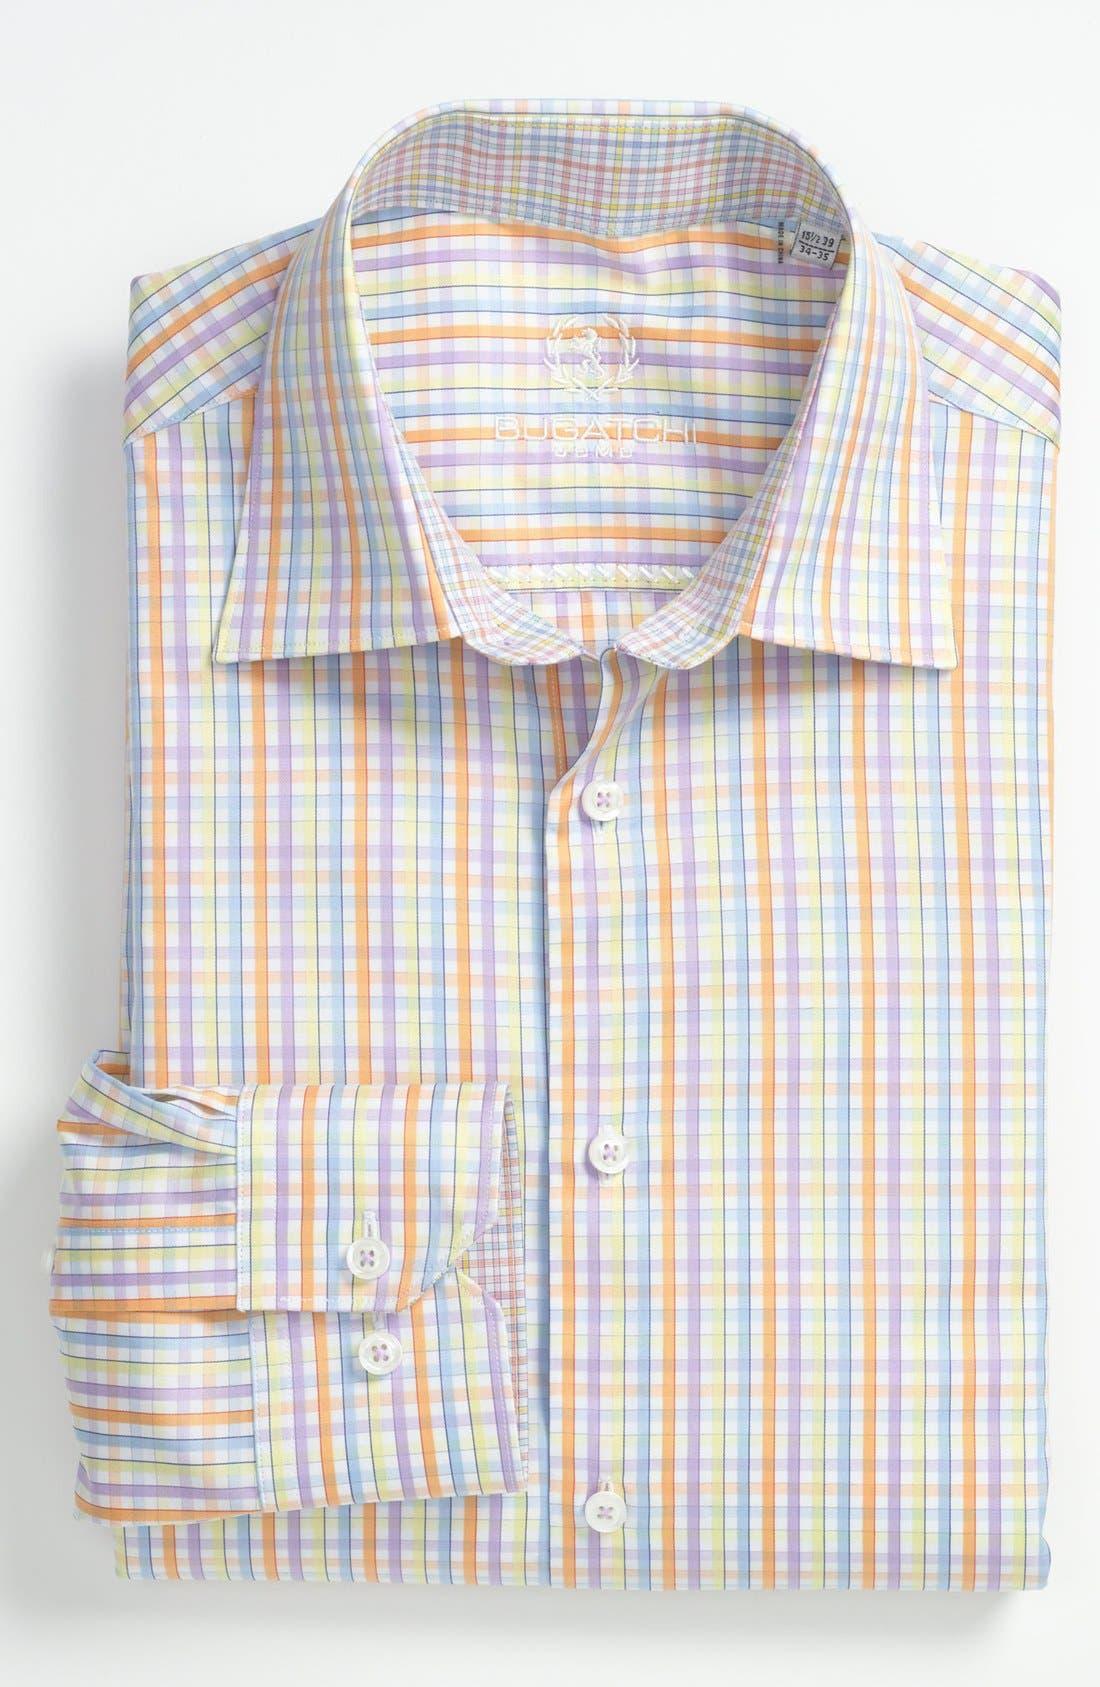 Alternate Image 1 Selected - Bugatchi Uomo Trim Fit Dress Shirt